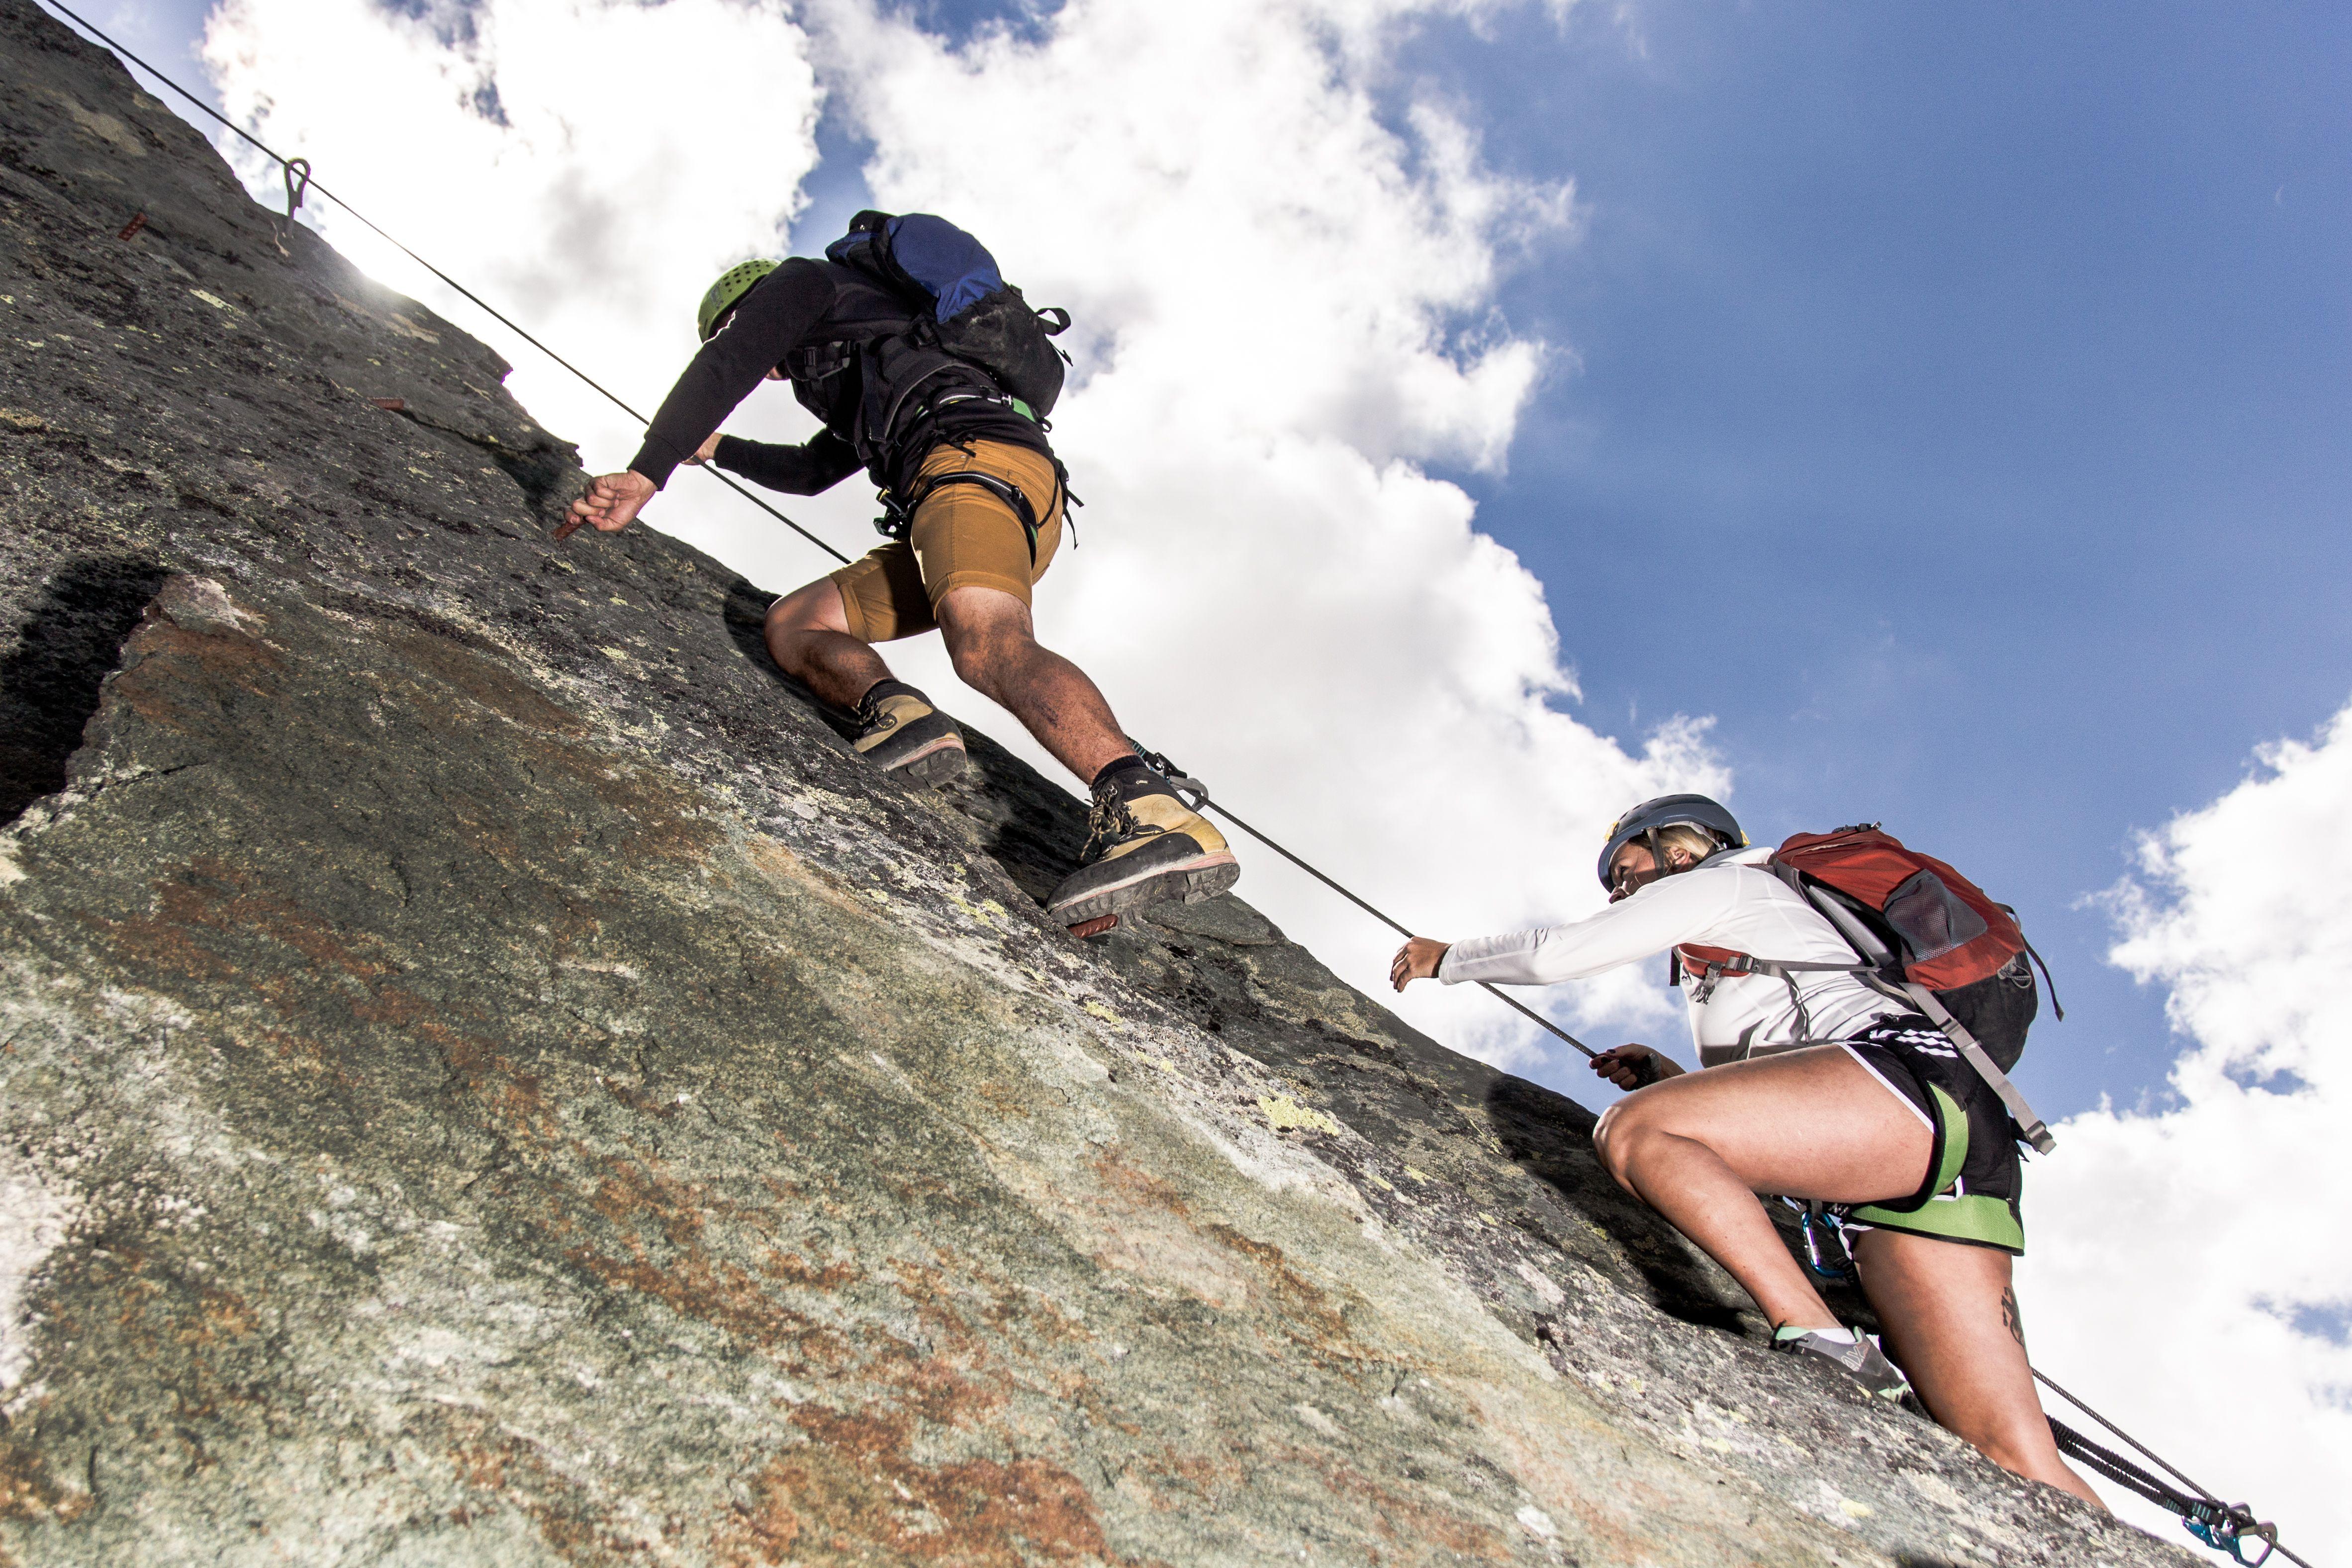 Klettersteig Jegihorn : Klettersteig am mittaghorn klettern in saas fee pinterest